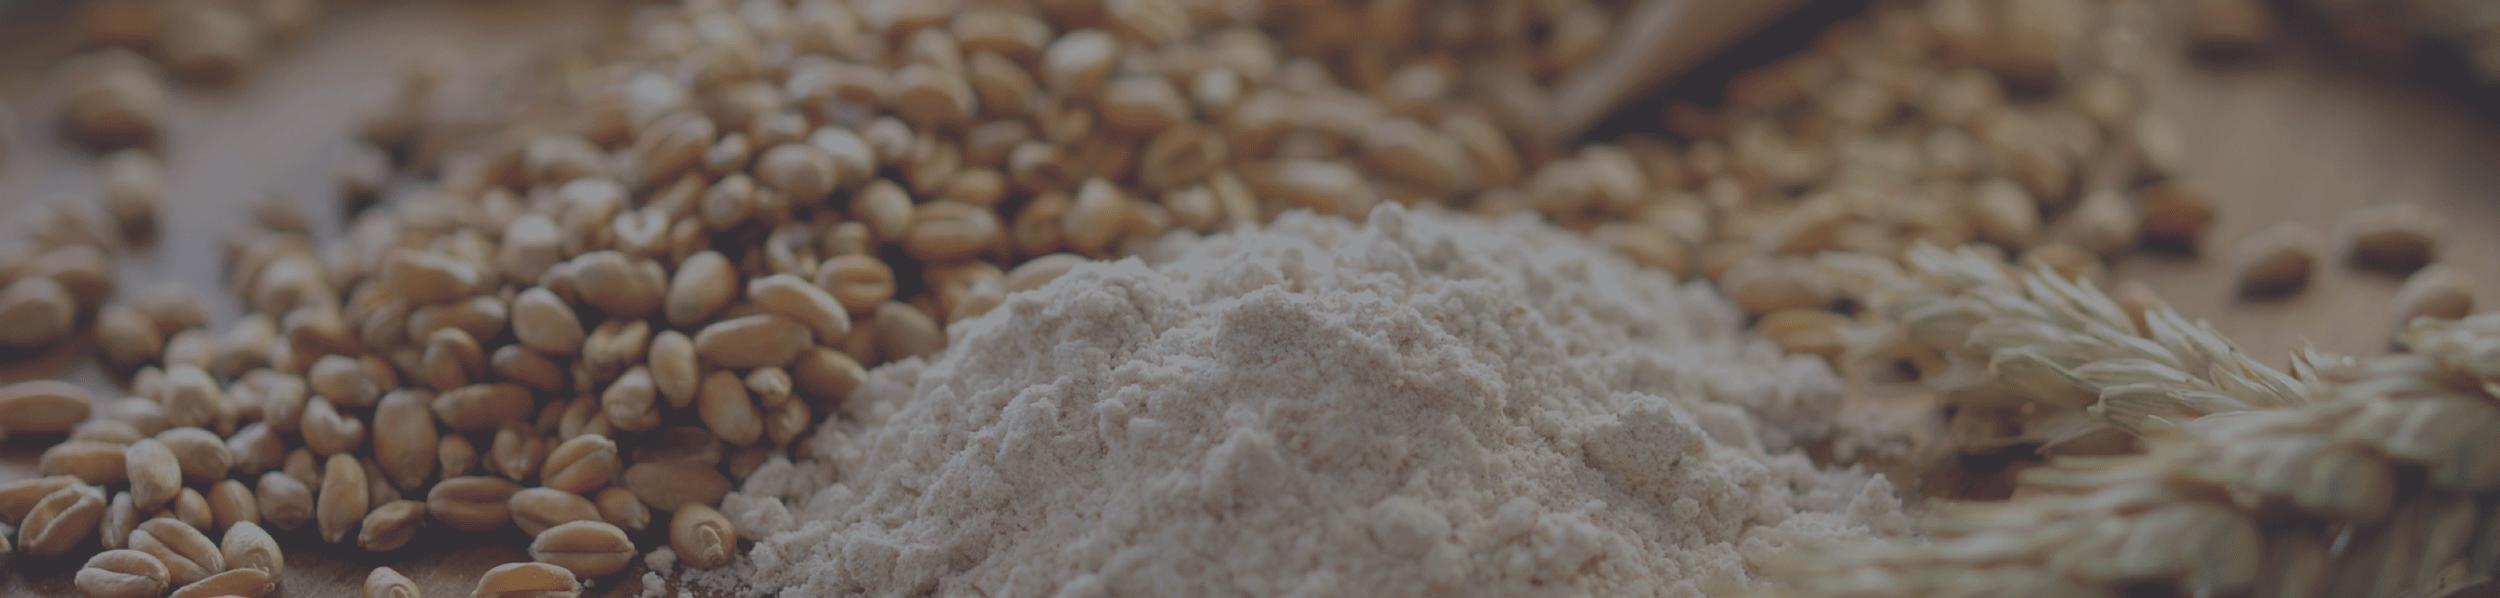 grains & feed